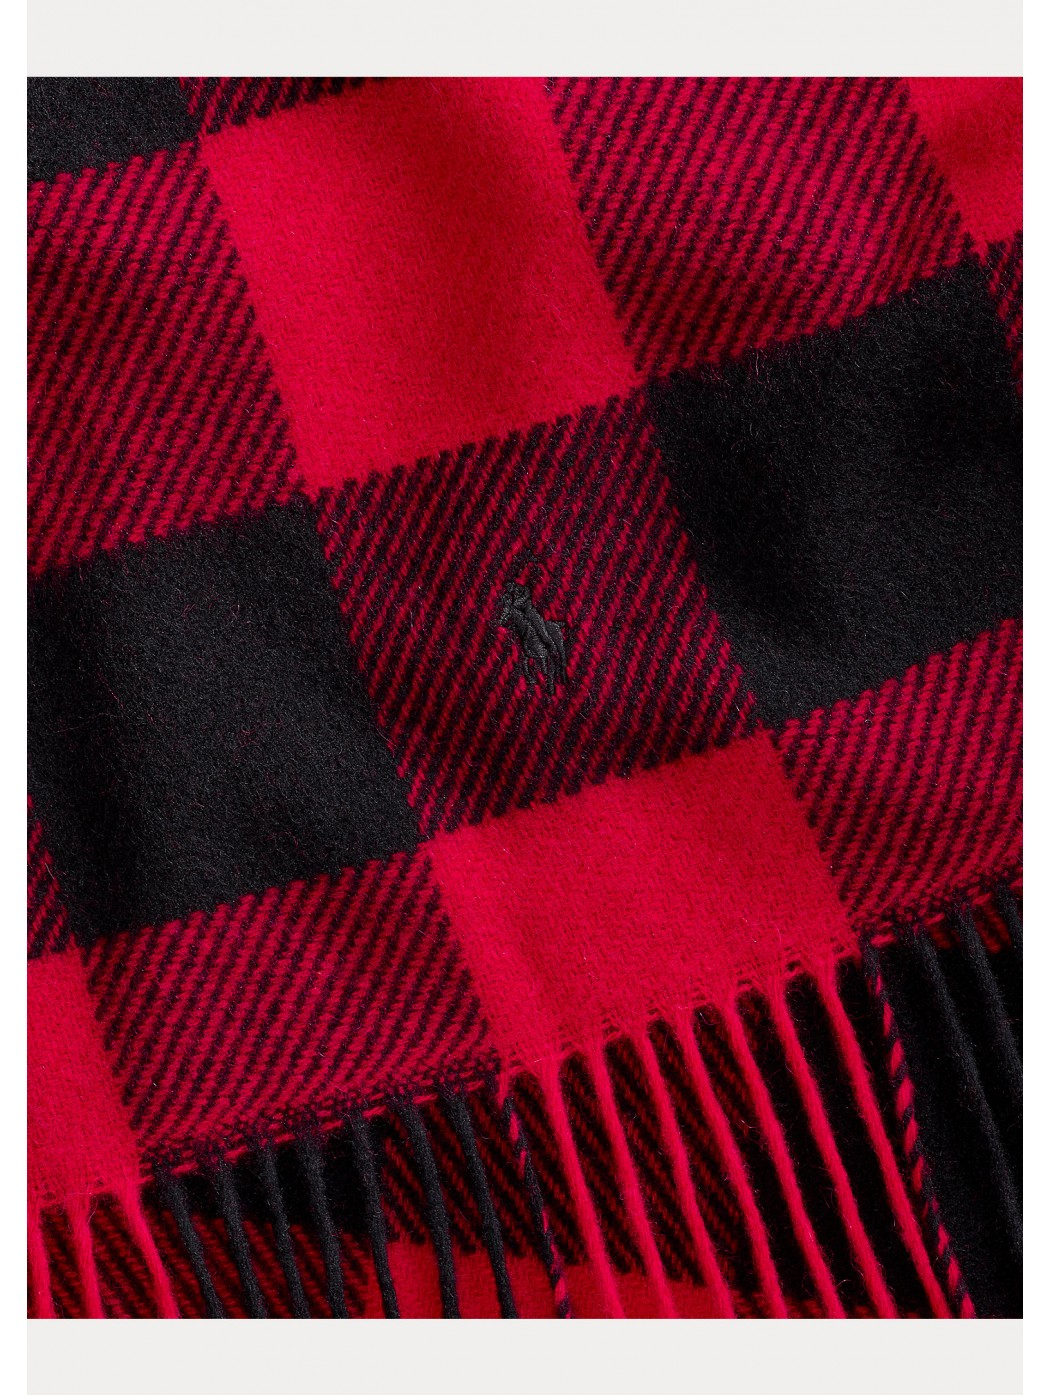 Sciarpa scozzese in lana con frange POLO RALPH LAUREN UOMO 455823065 002